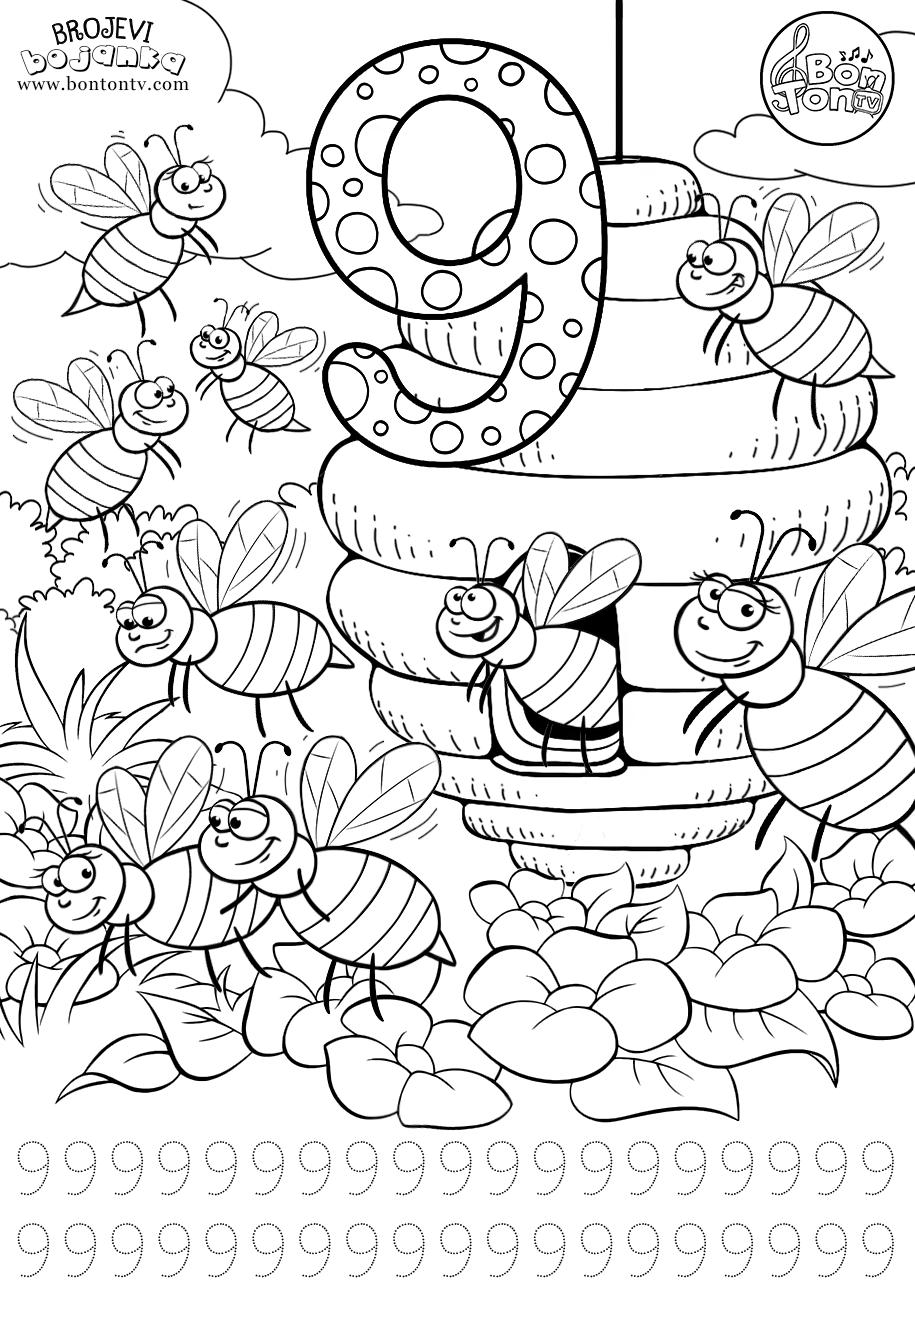 Number 9 preschool printables worksheets coloring pages for kids learning numbers counting 1 10 broj 9 bojanke za djecu brojevi radni listovi